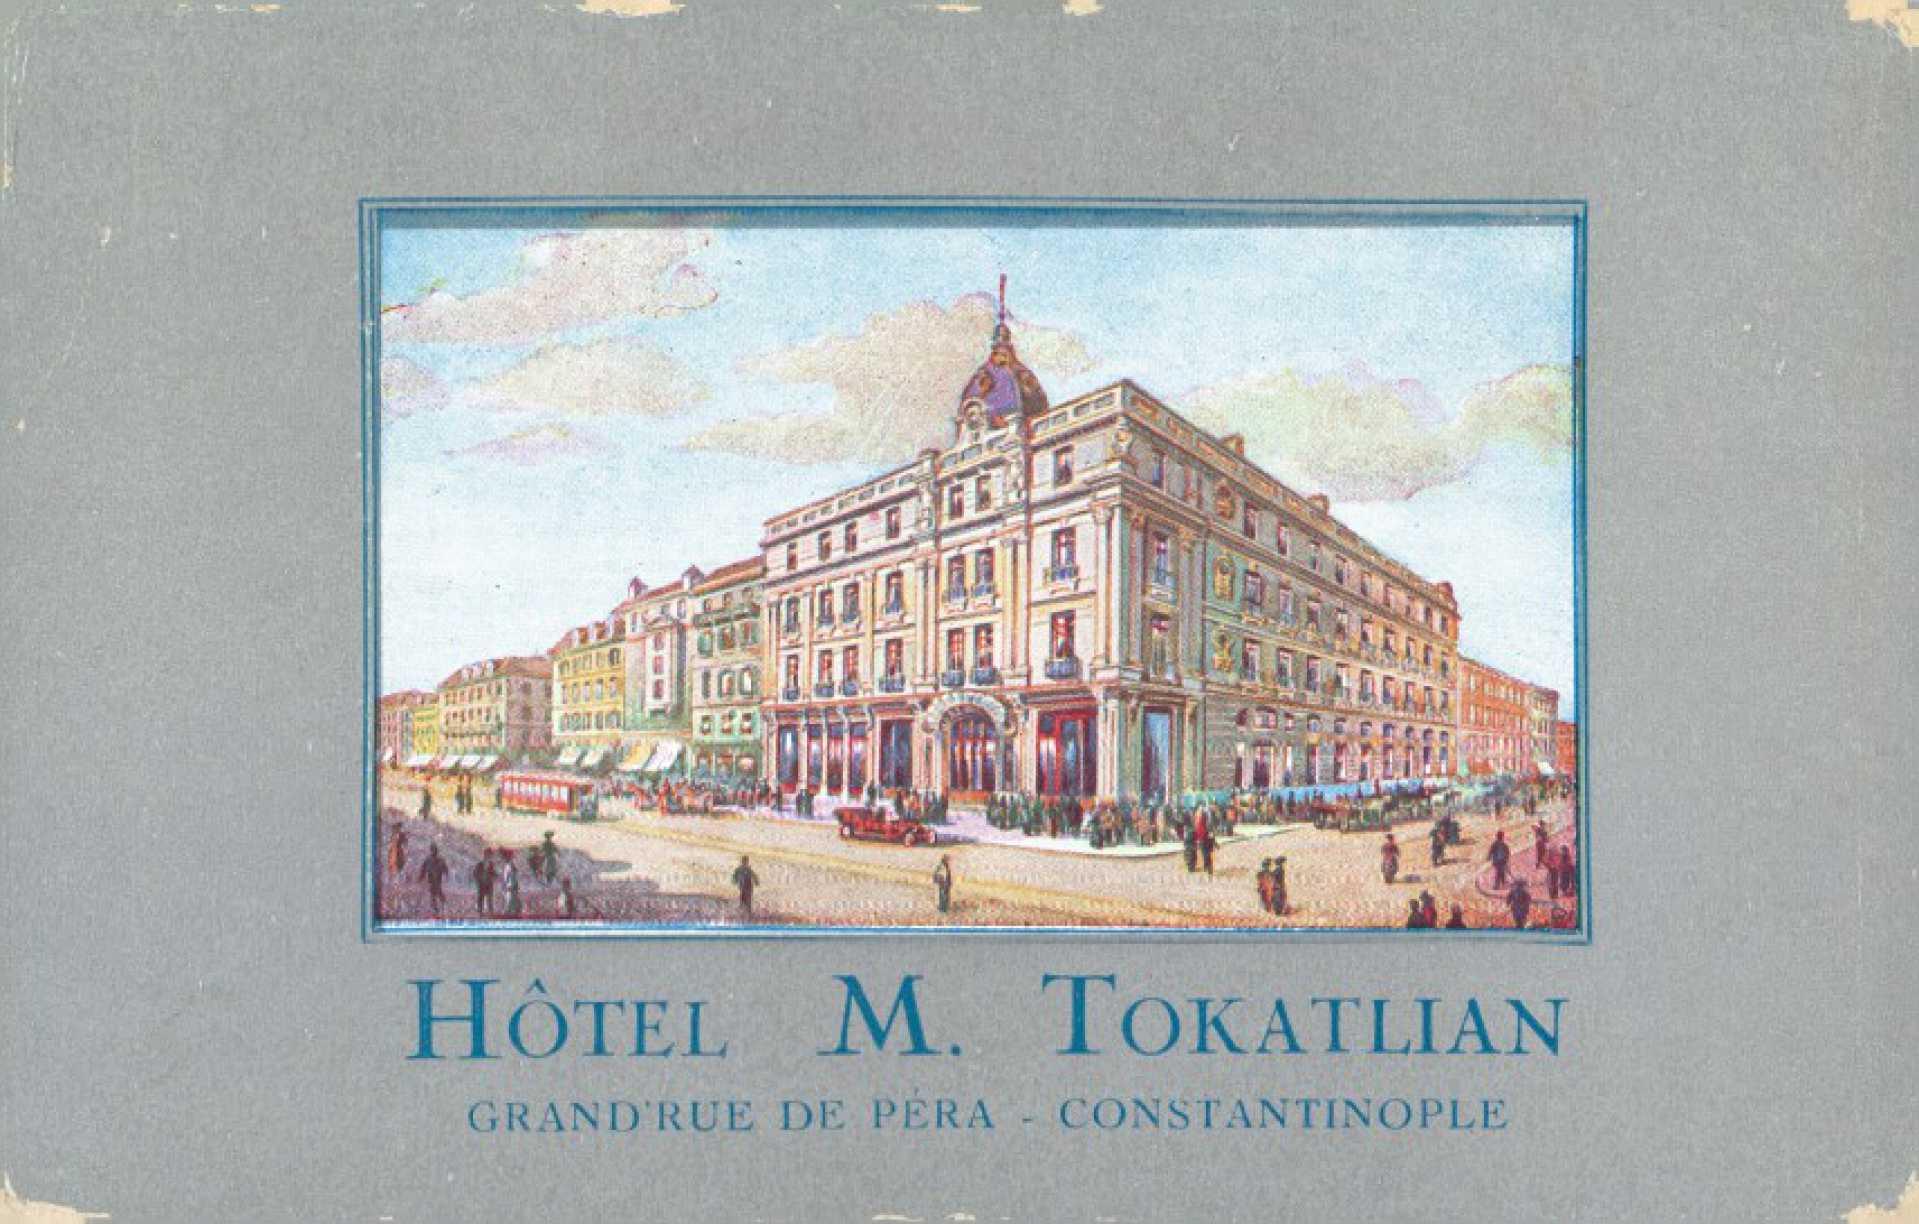 Hotel M. Tokatlian